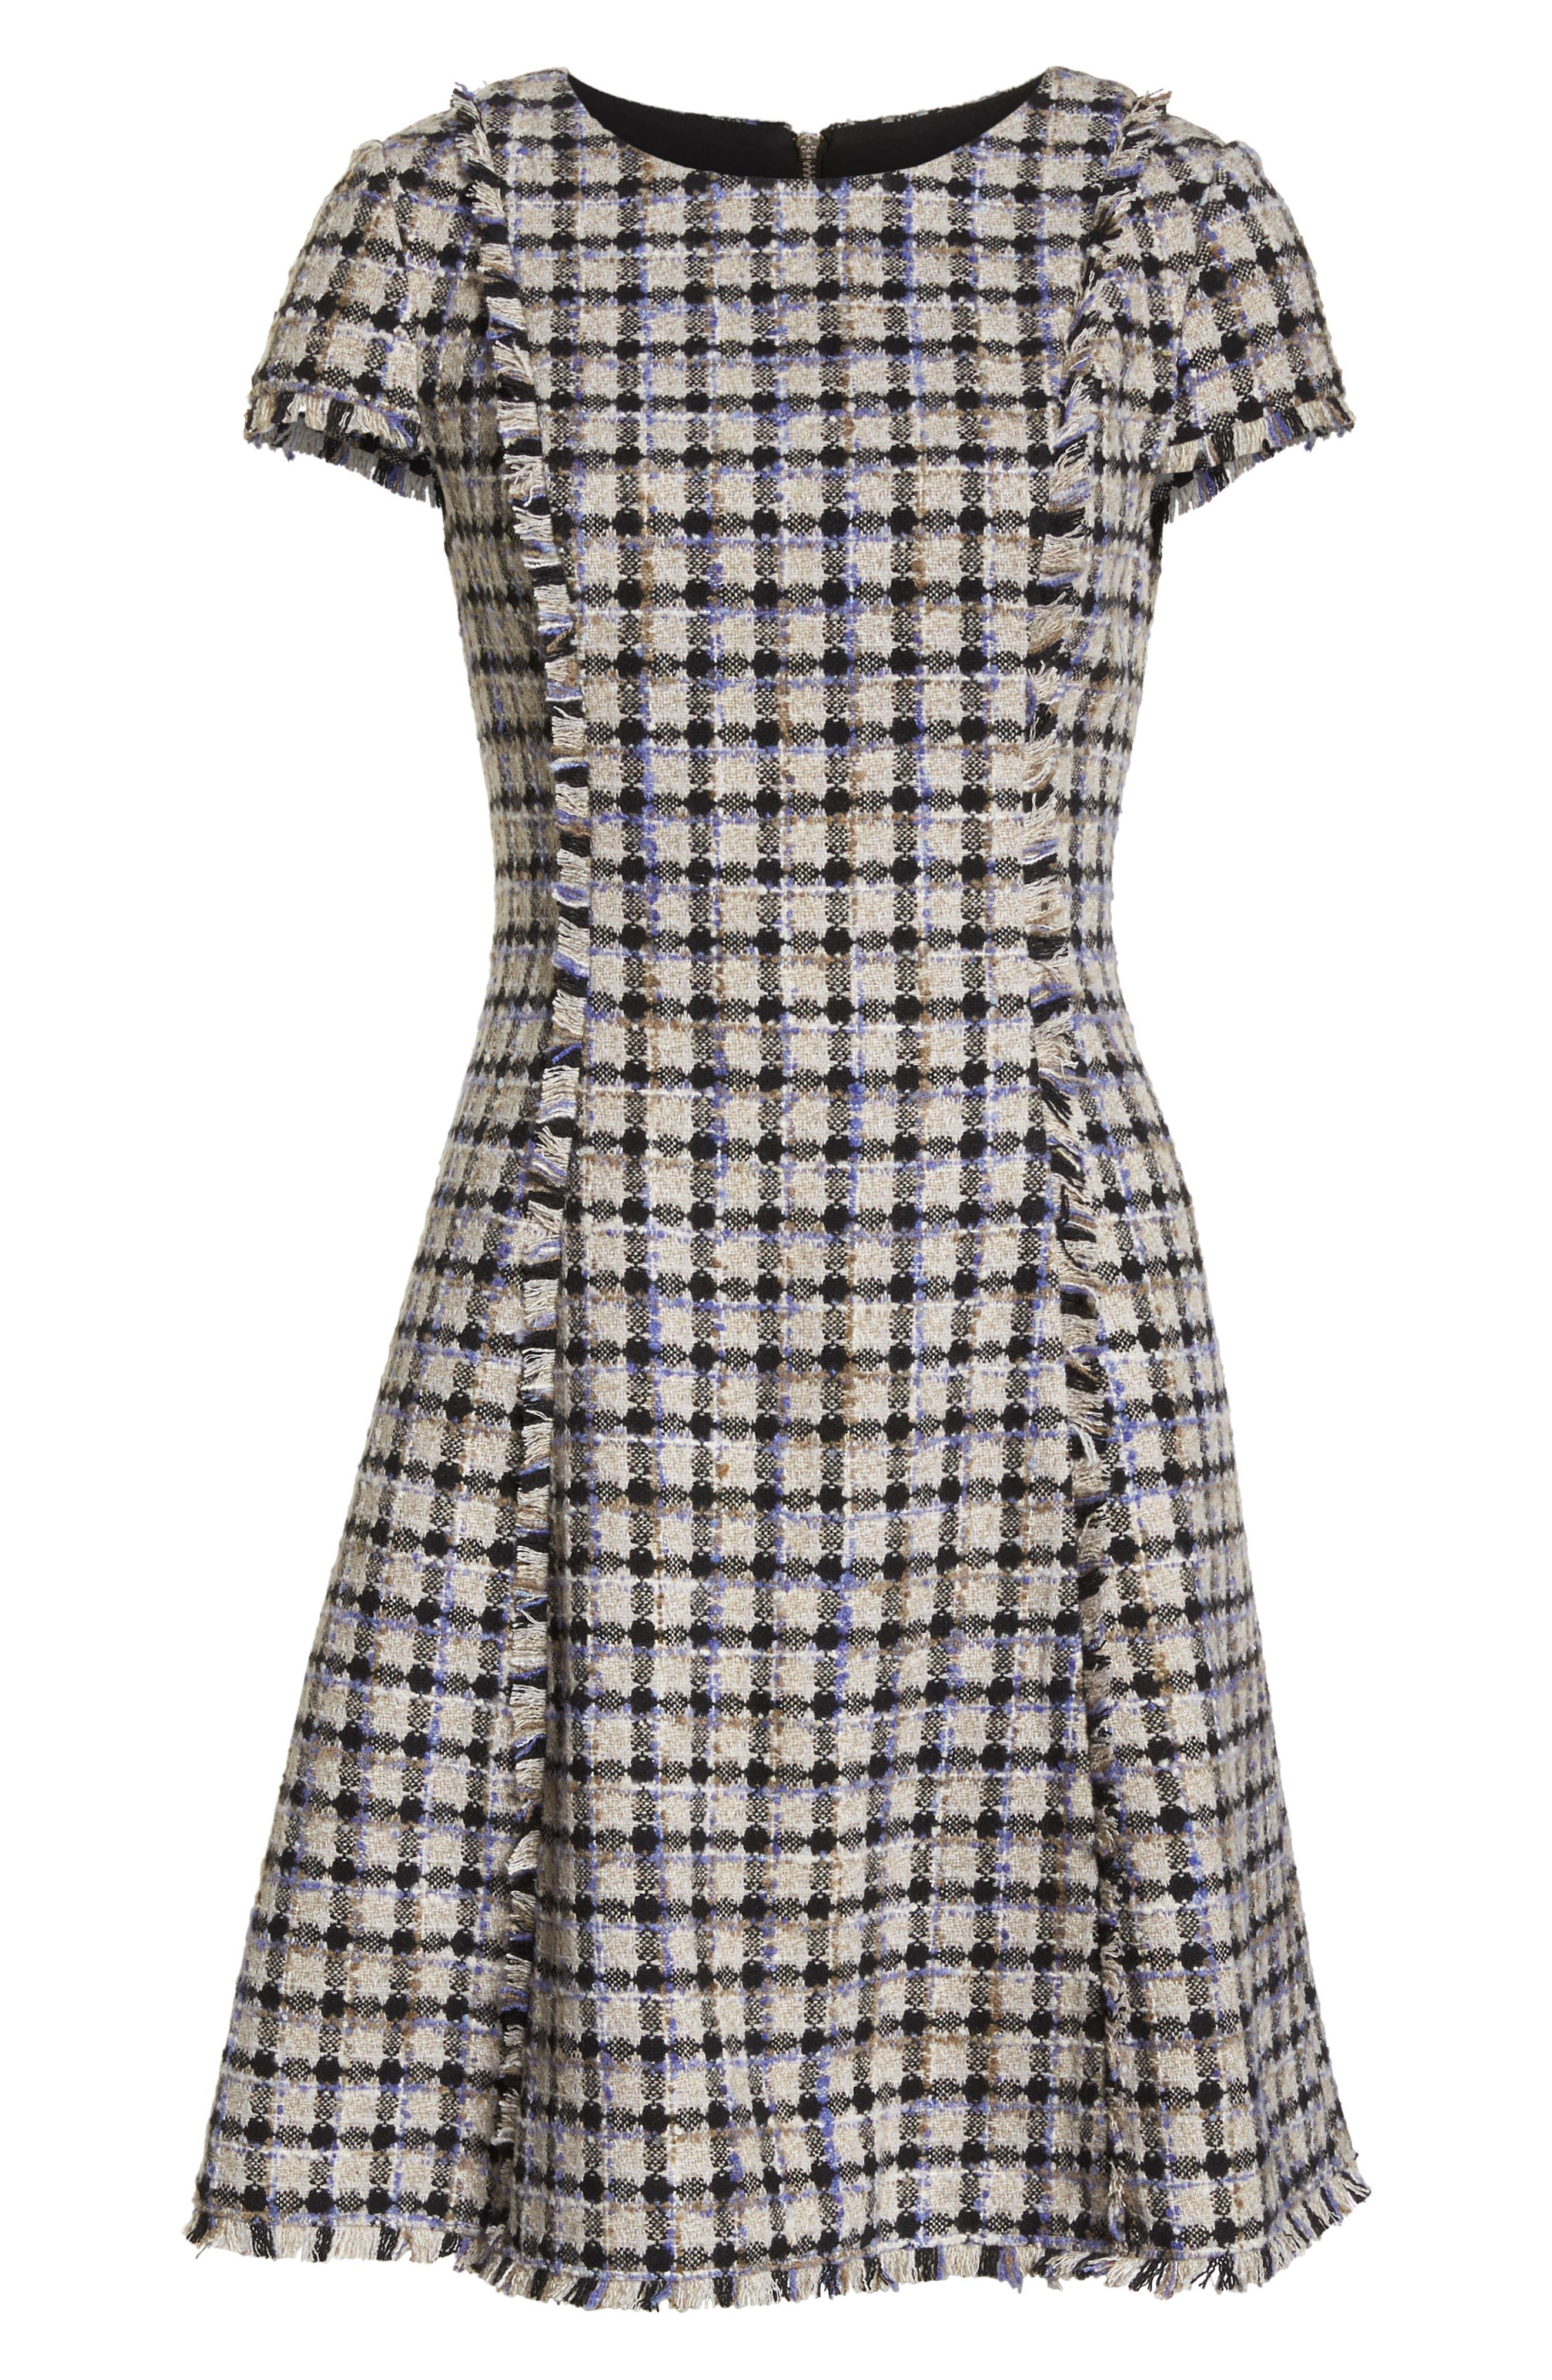 ELIZA J, Cap Sleeve Fit & Flare Dress, Alternate thumbnail 7, color, 900